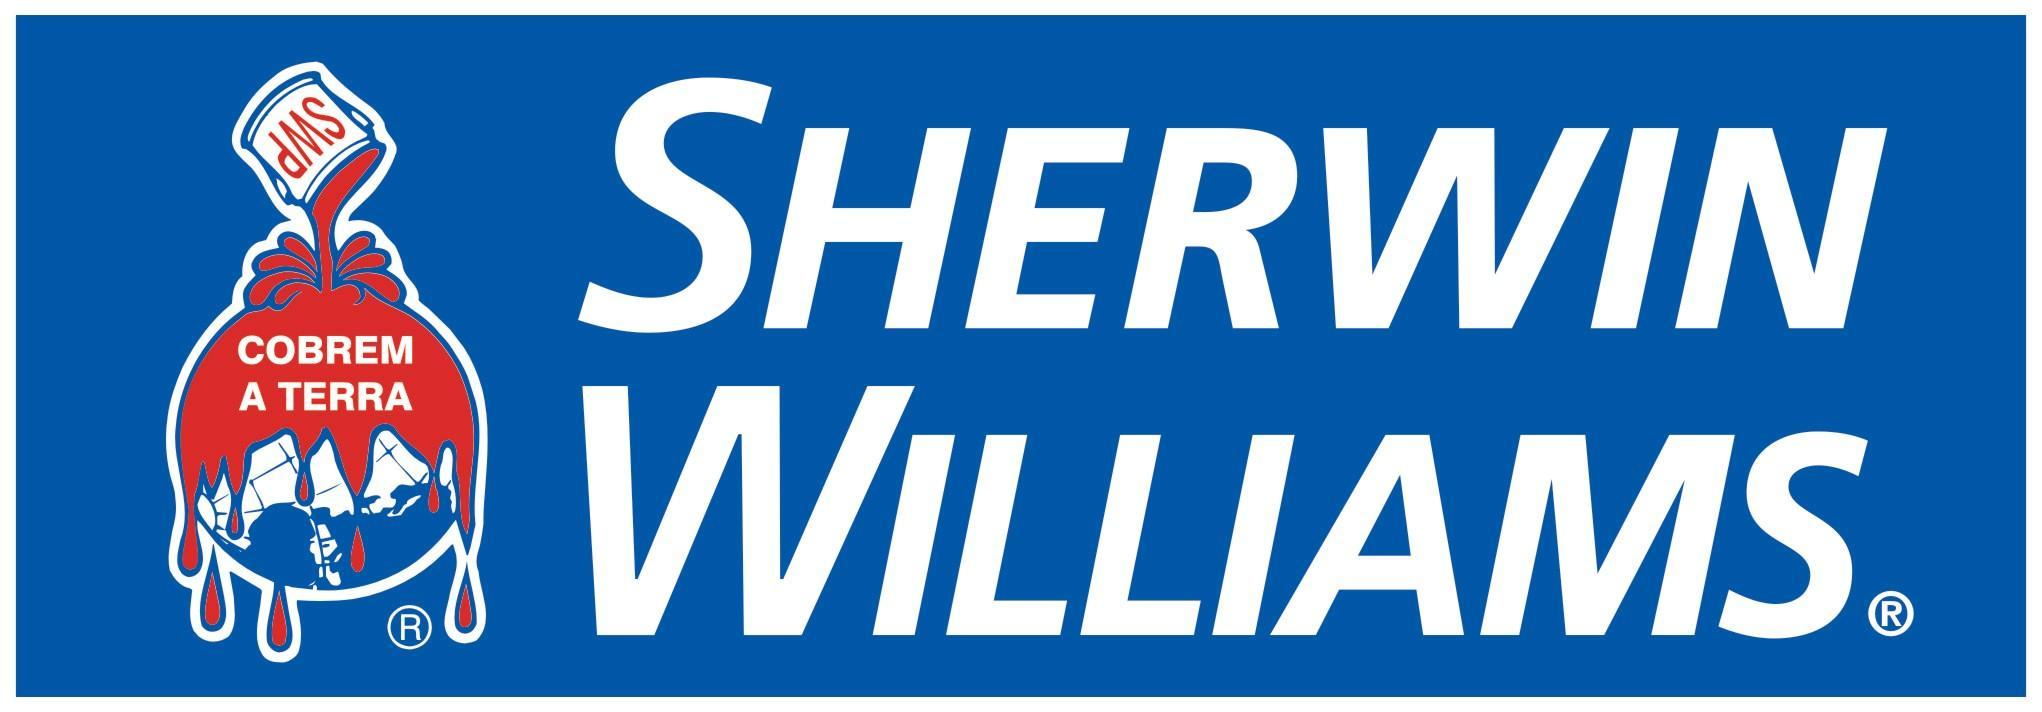 The Sherwin Williams Company Logo